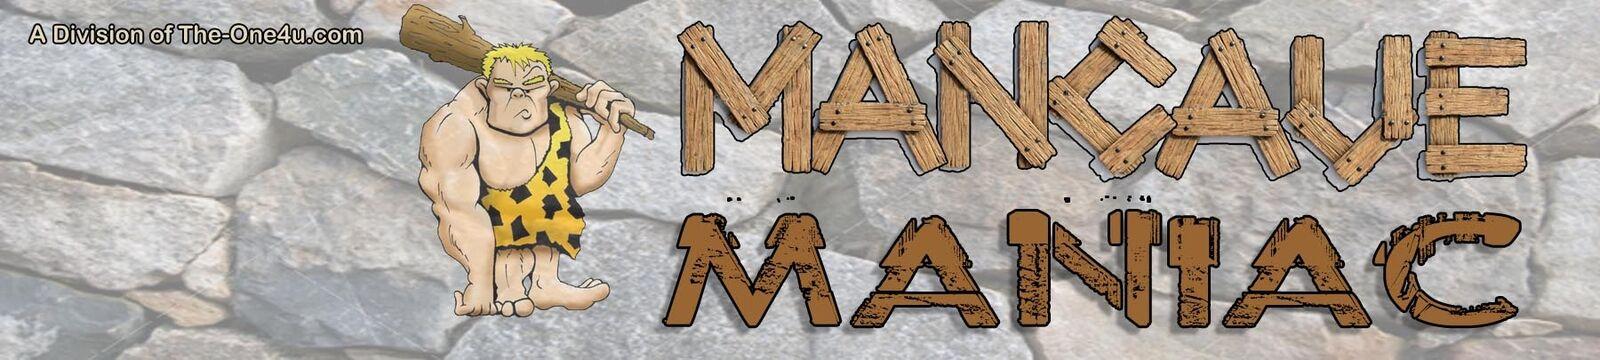 ManCaveManiac